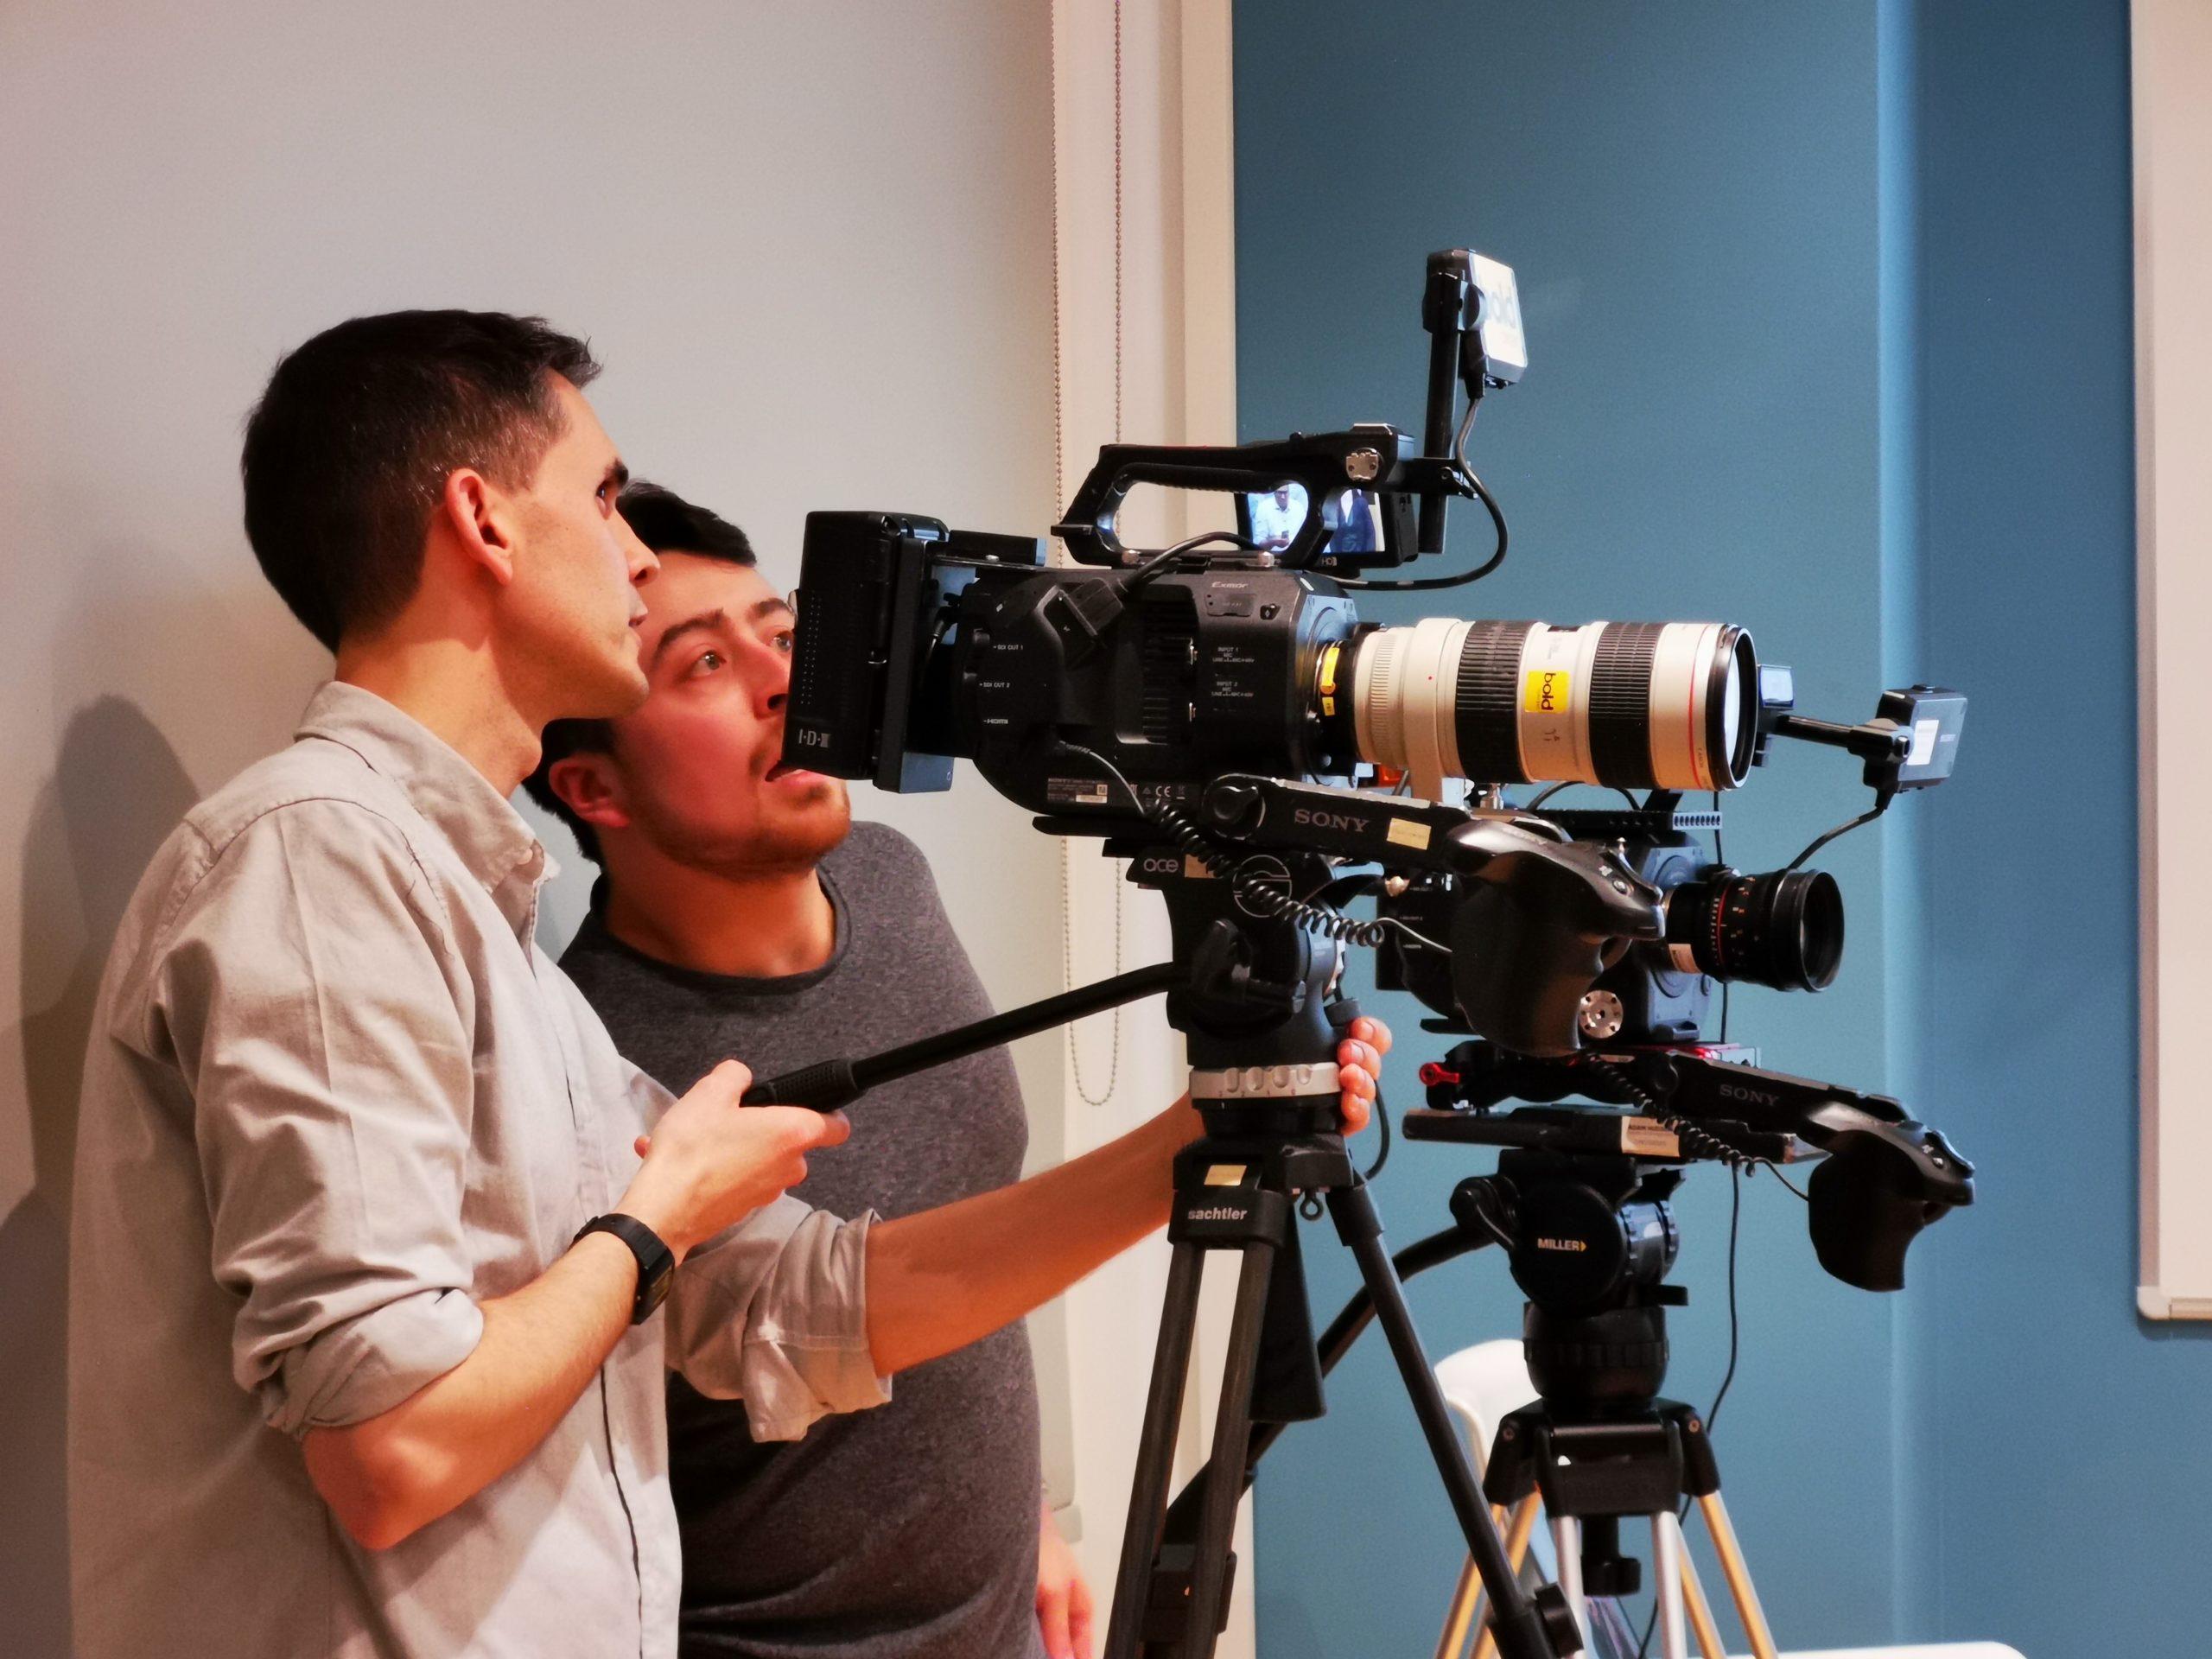 two cameramen using a camera on a shoot